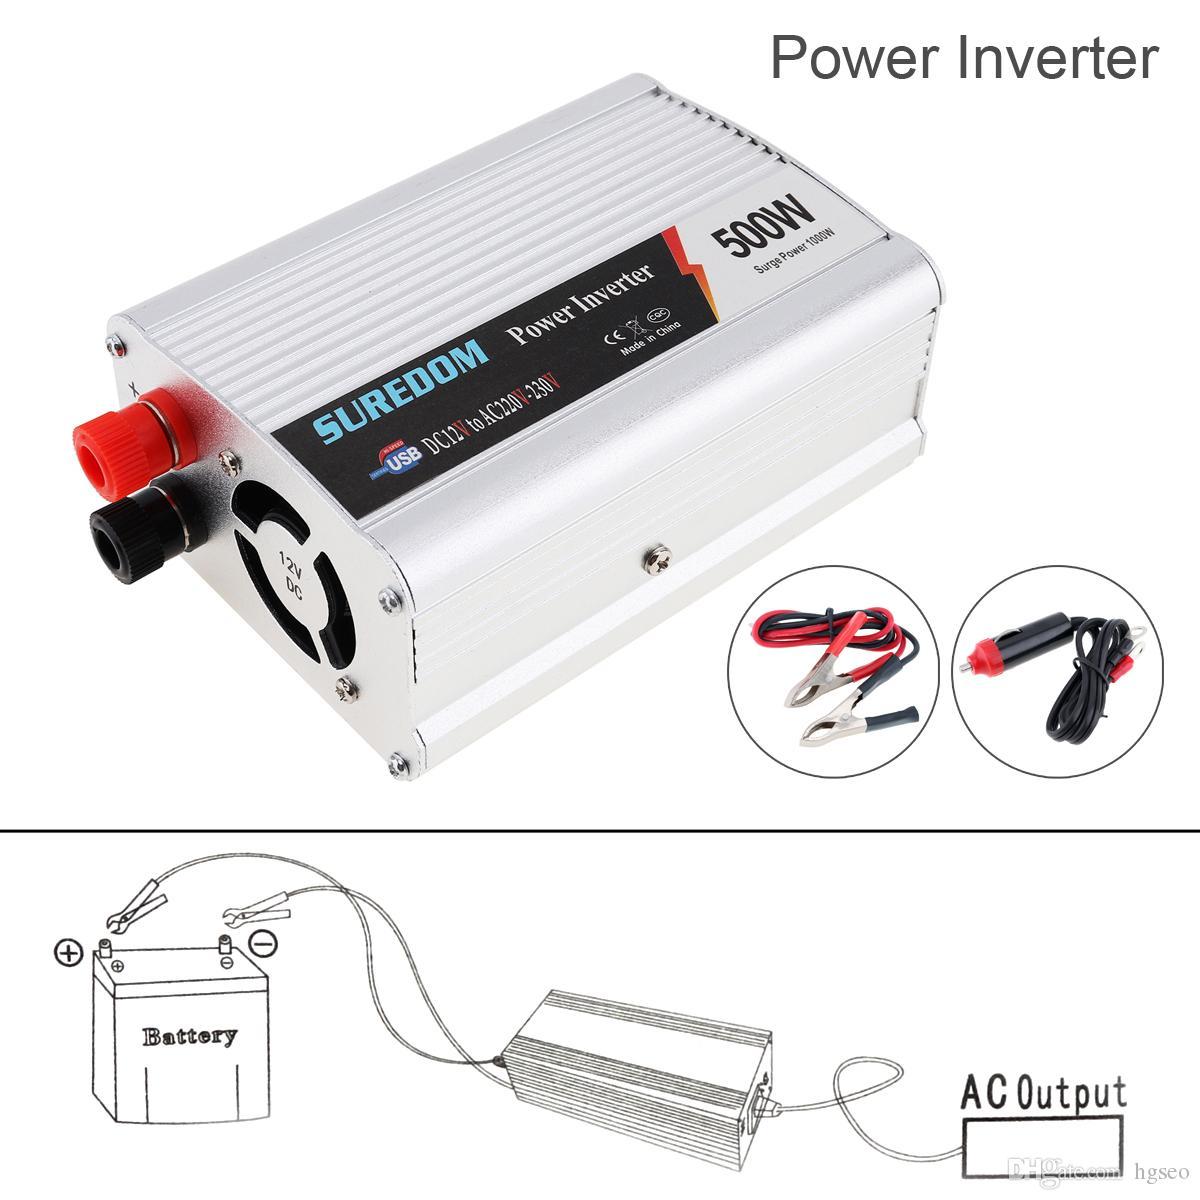 Nuevo Power USB DC 12V a 220V Adaptador de cargador Coche inversor convertidor